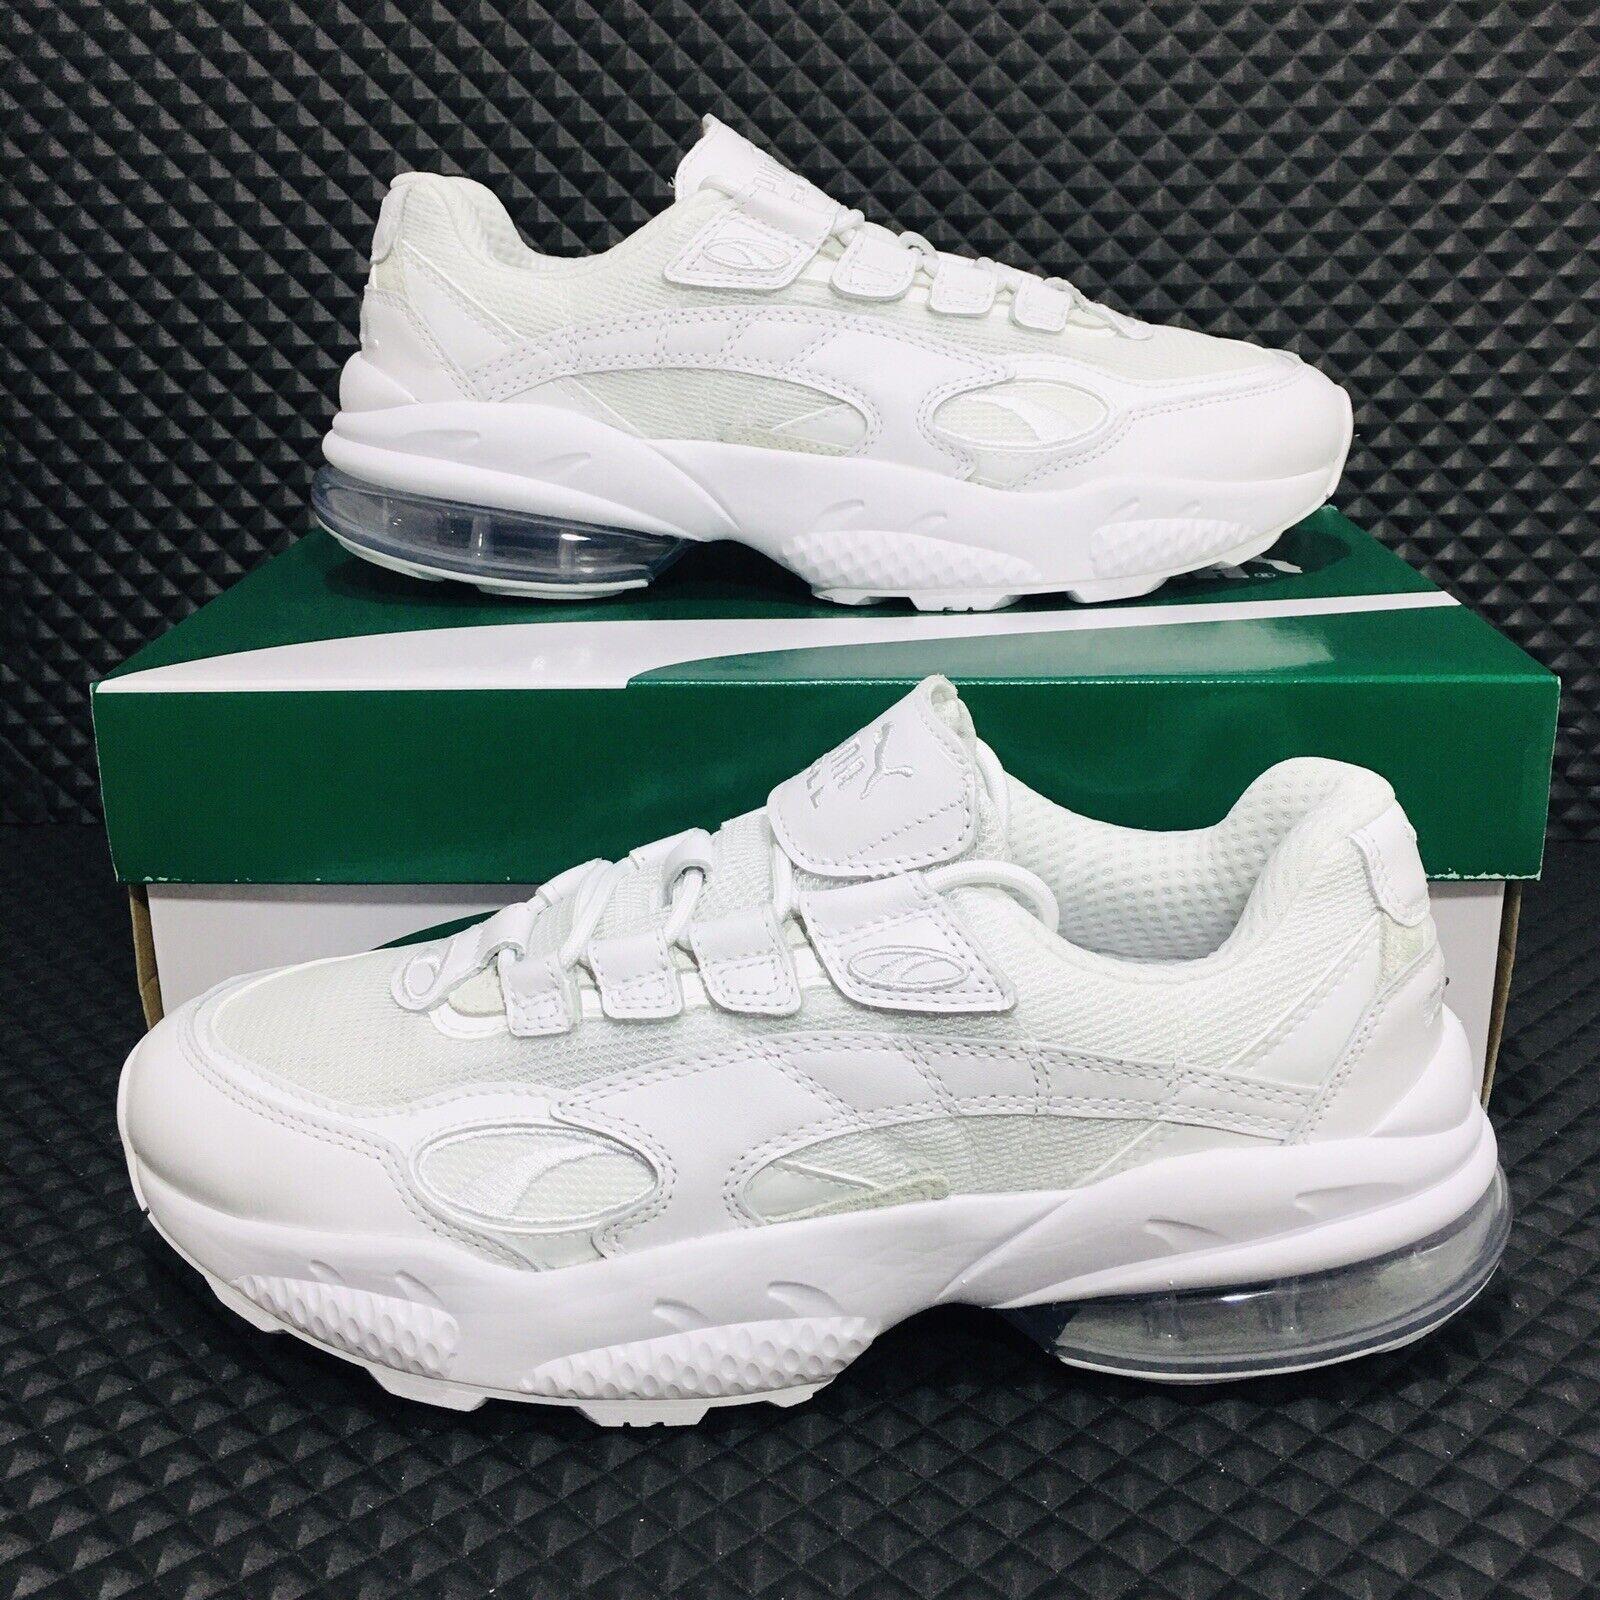 PUMA Cell Venom Reflective White Shoes